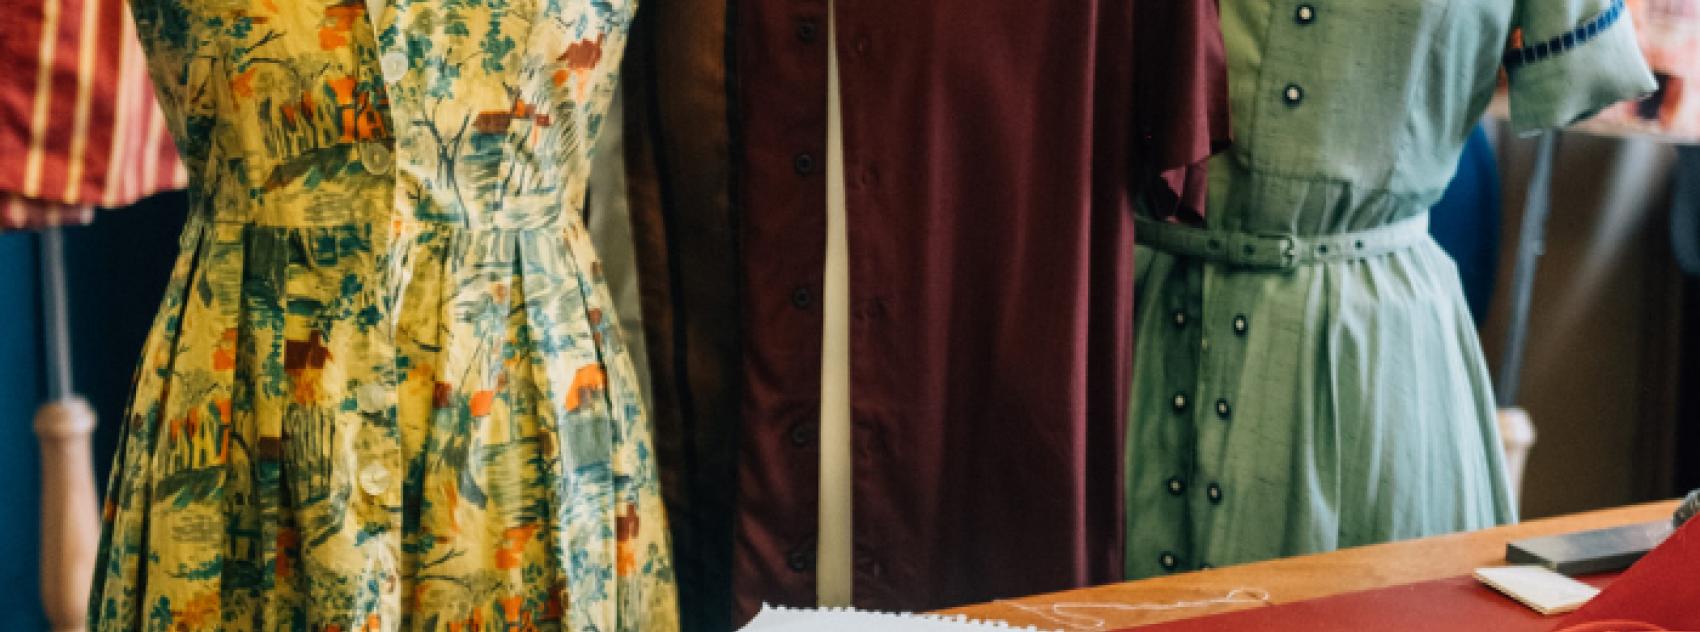 Streetcar Costume Featured